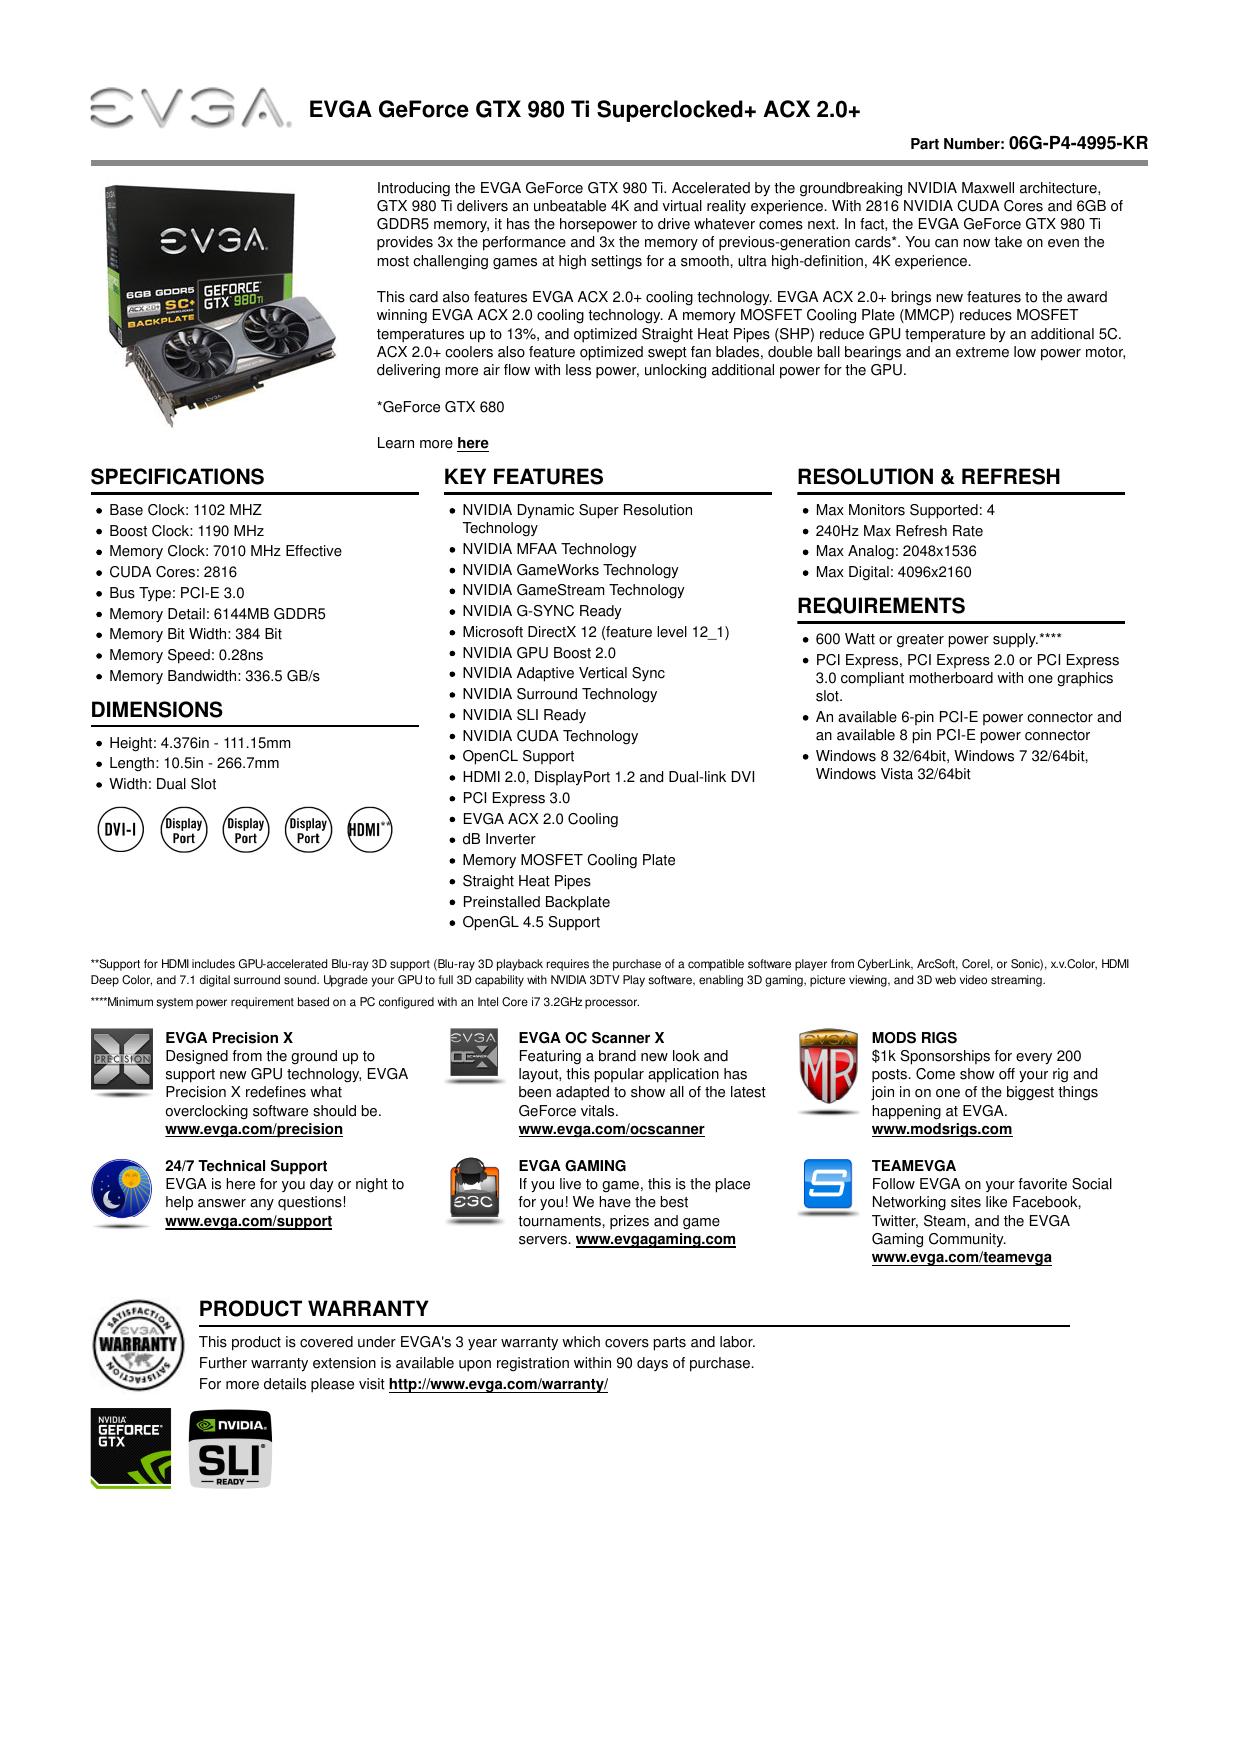 EVGA - Product Specs - EVGA GeForce GTX 980 Ti   manualzz com